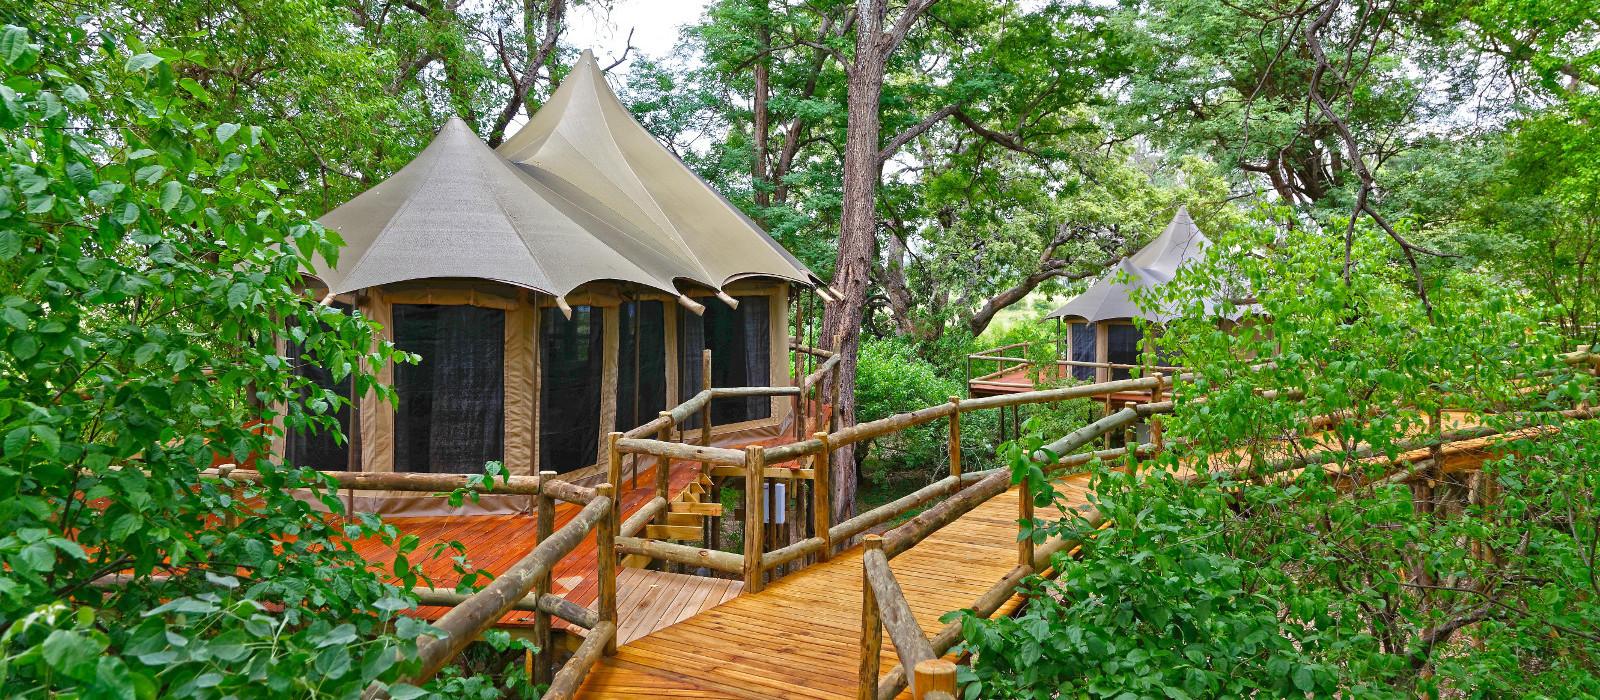 Hotel Nambwa Tented Lodge Namibia